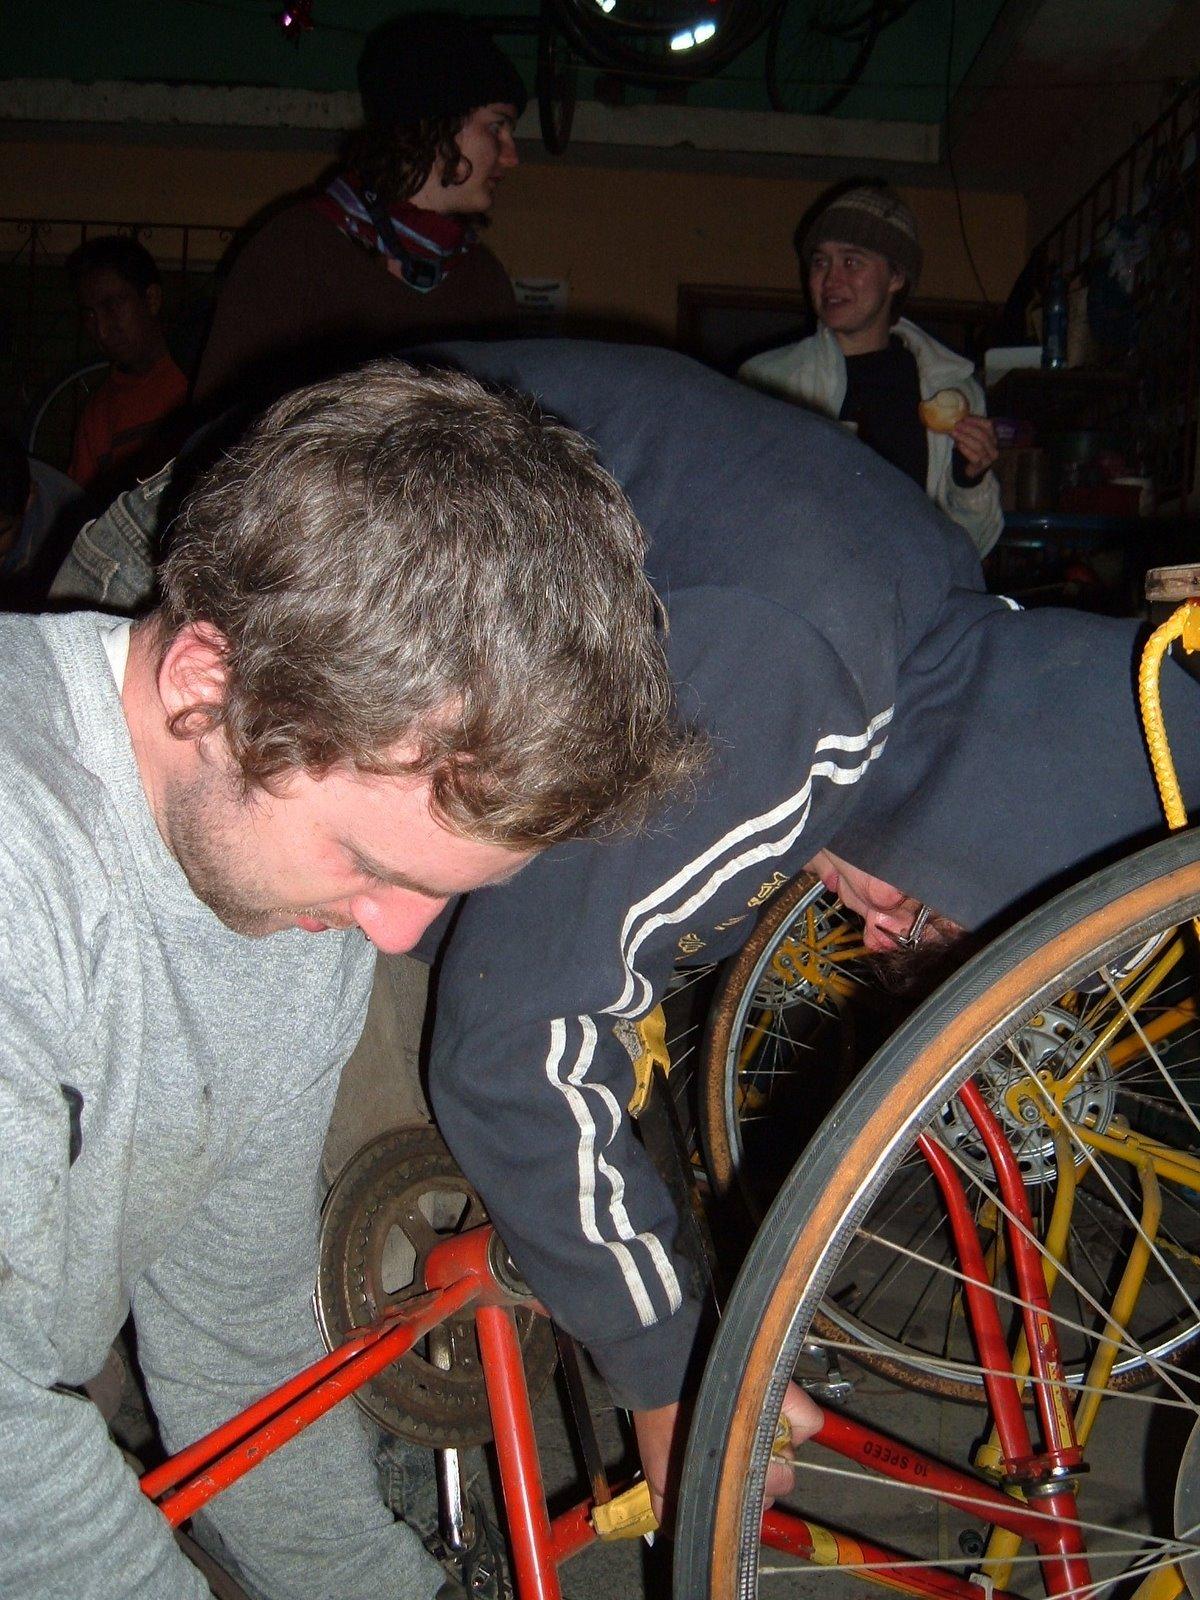 Matthew and Beth chop up a bike